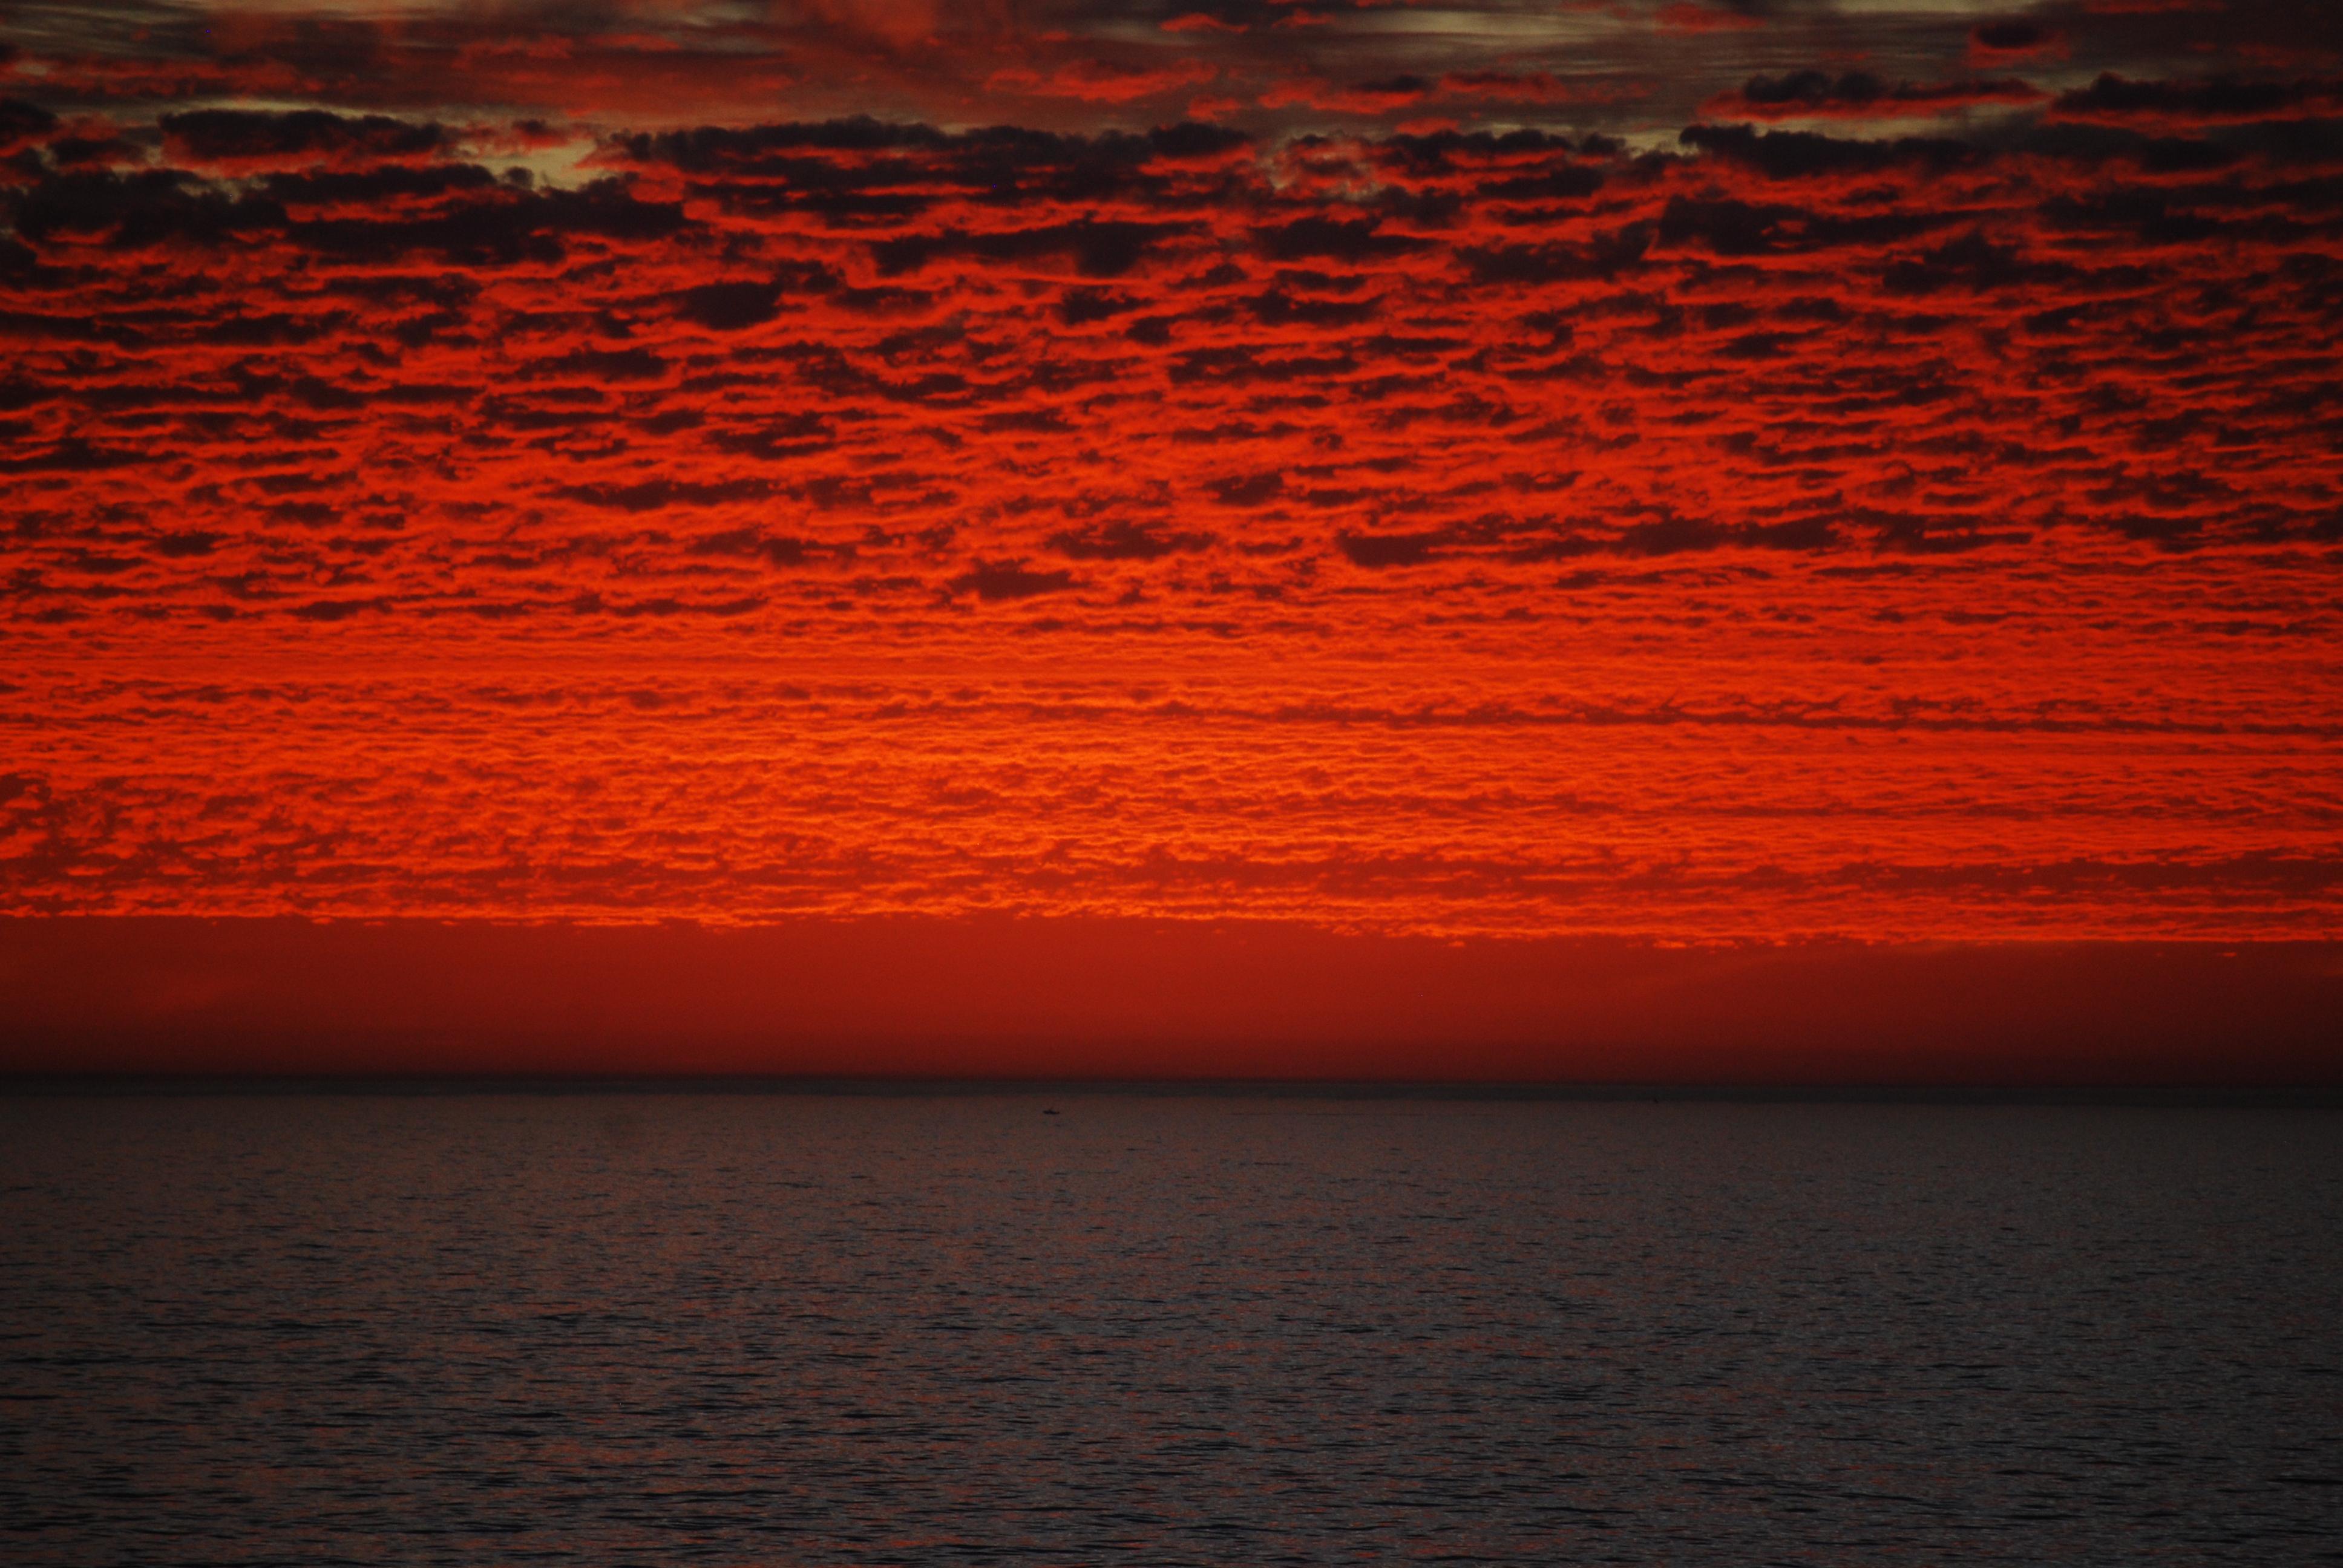 Photo of Sunset Cottesloe Beach, Perth, Western Australia - Taken April 2009